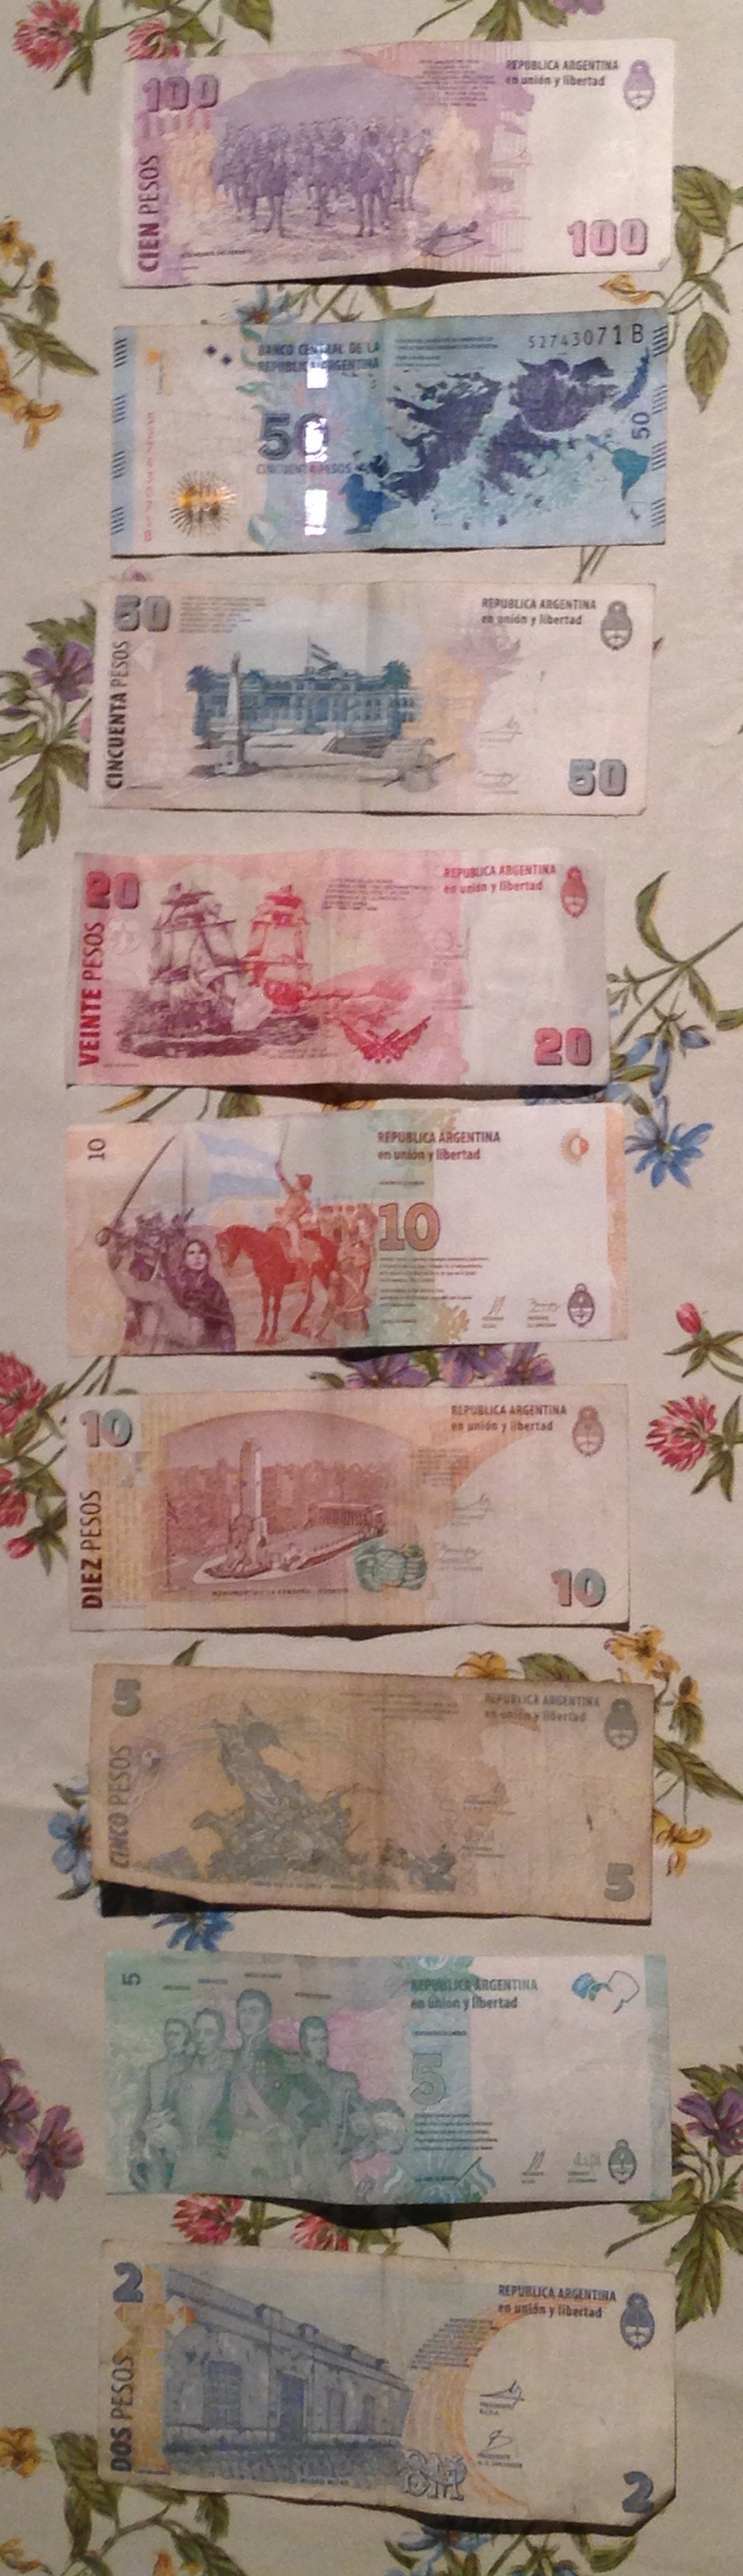 Argentina Currency Portrait.jpg